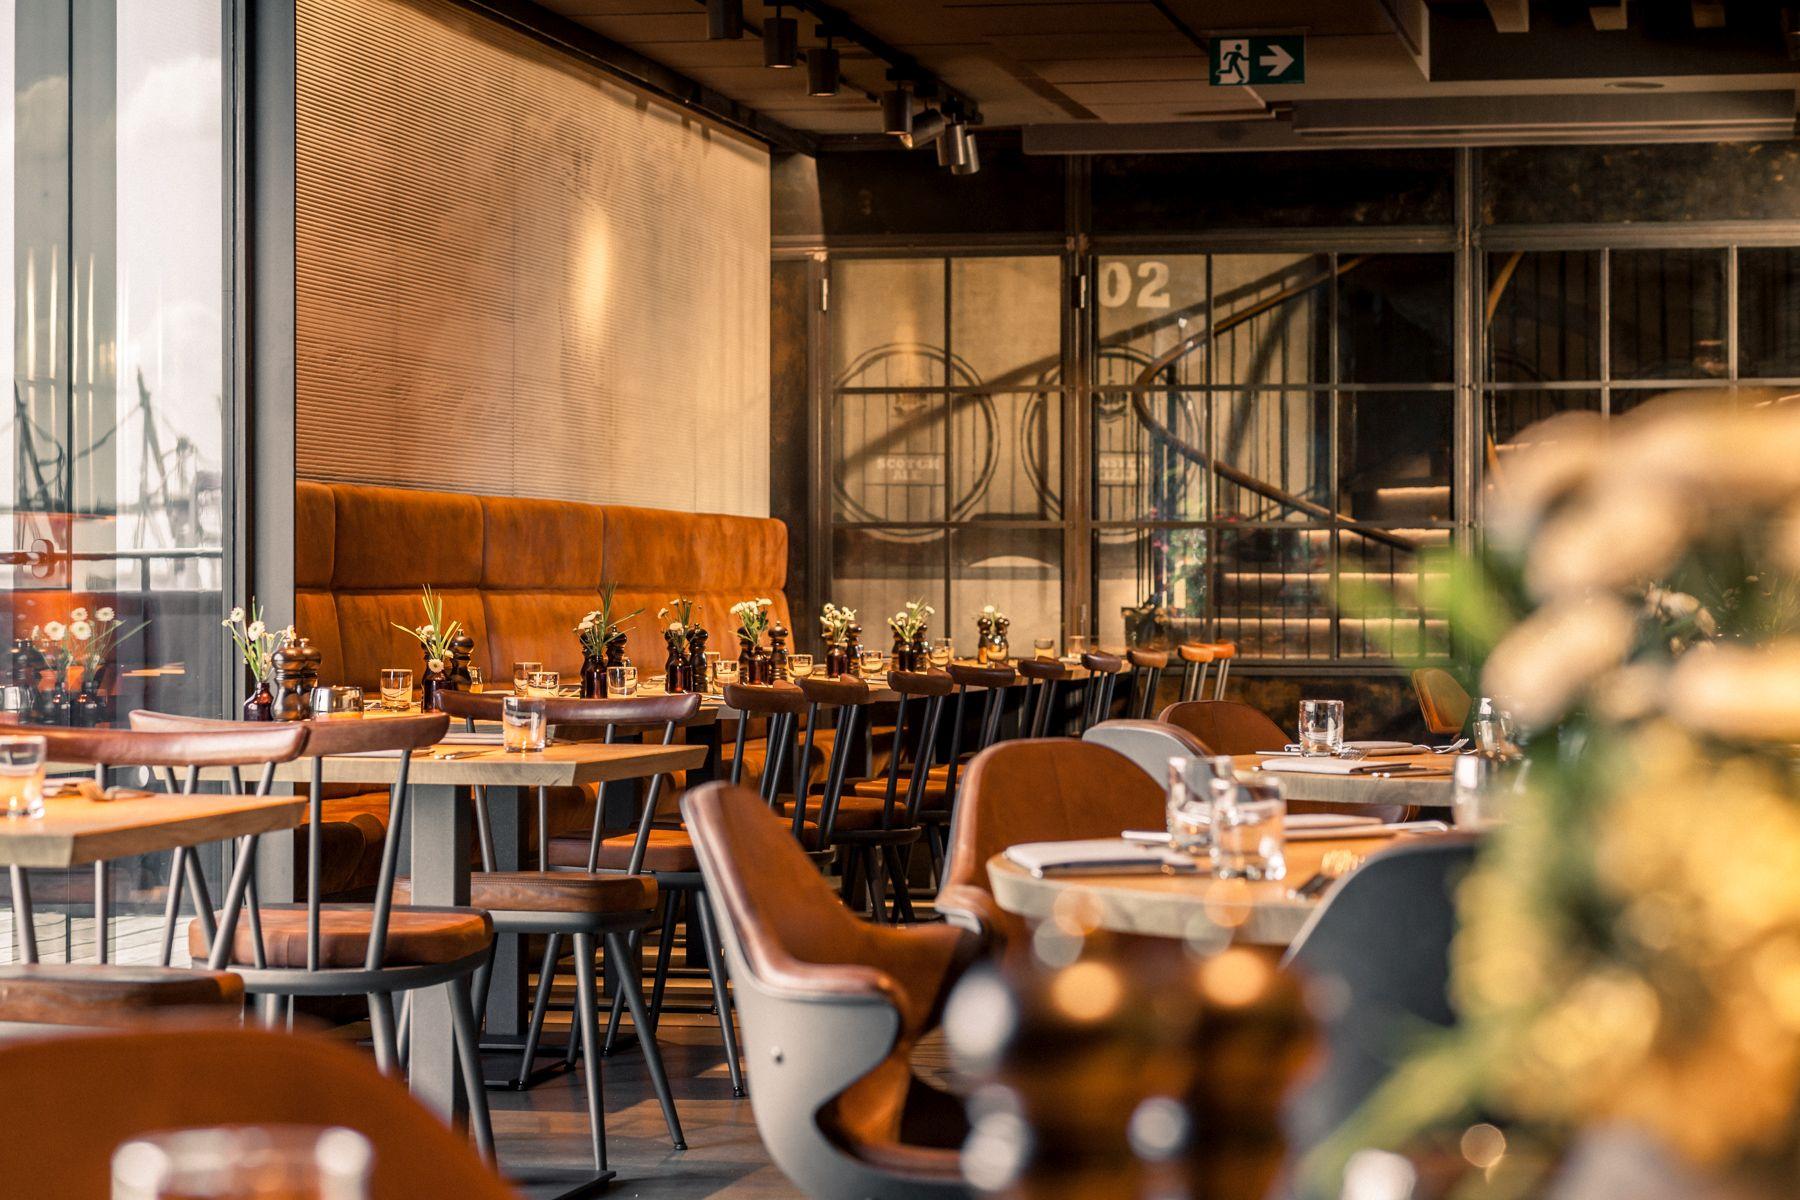 Galerie_Restaurant_Mood